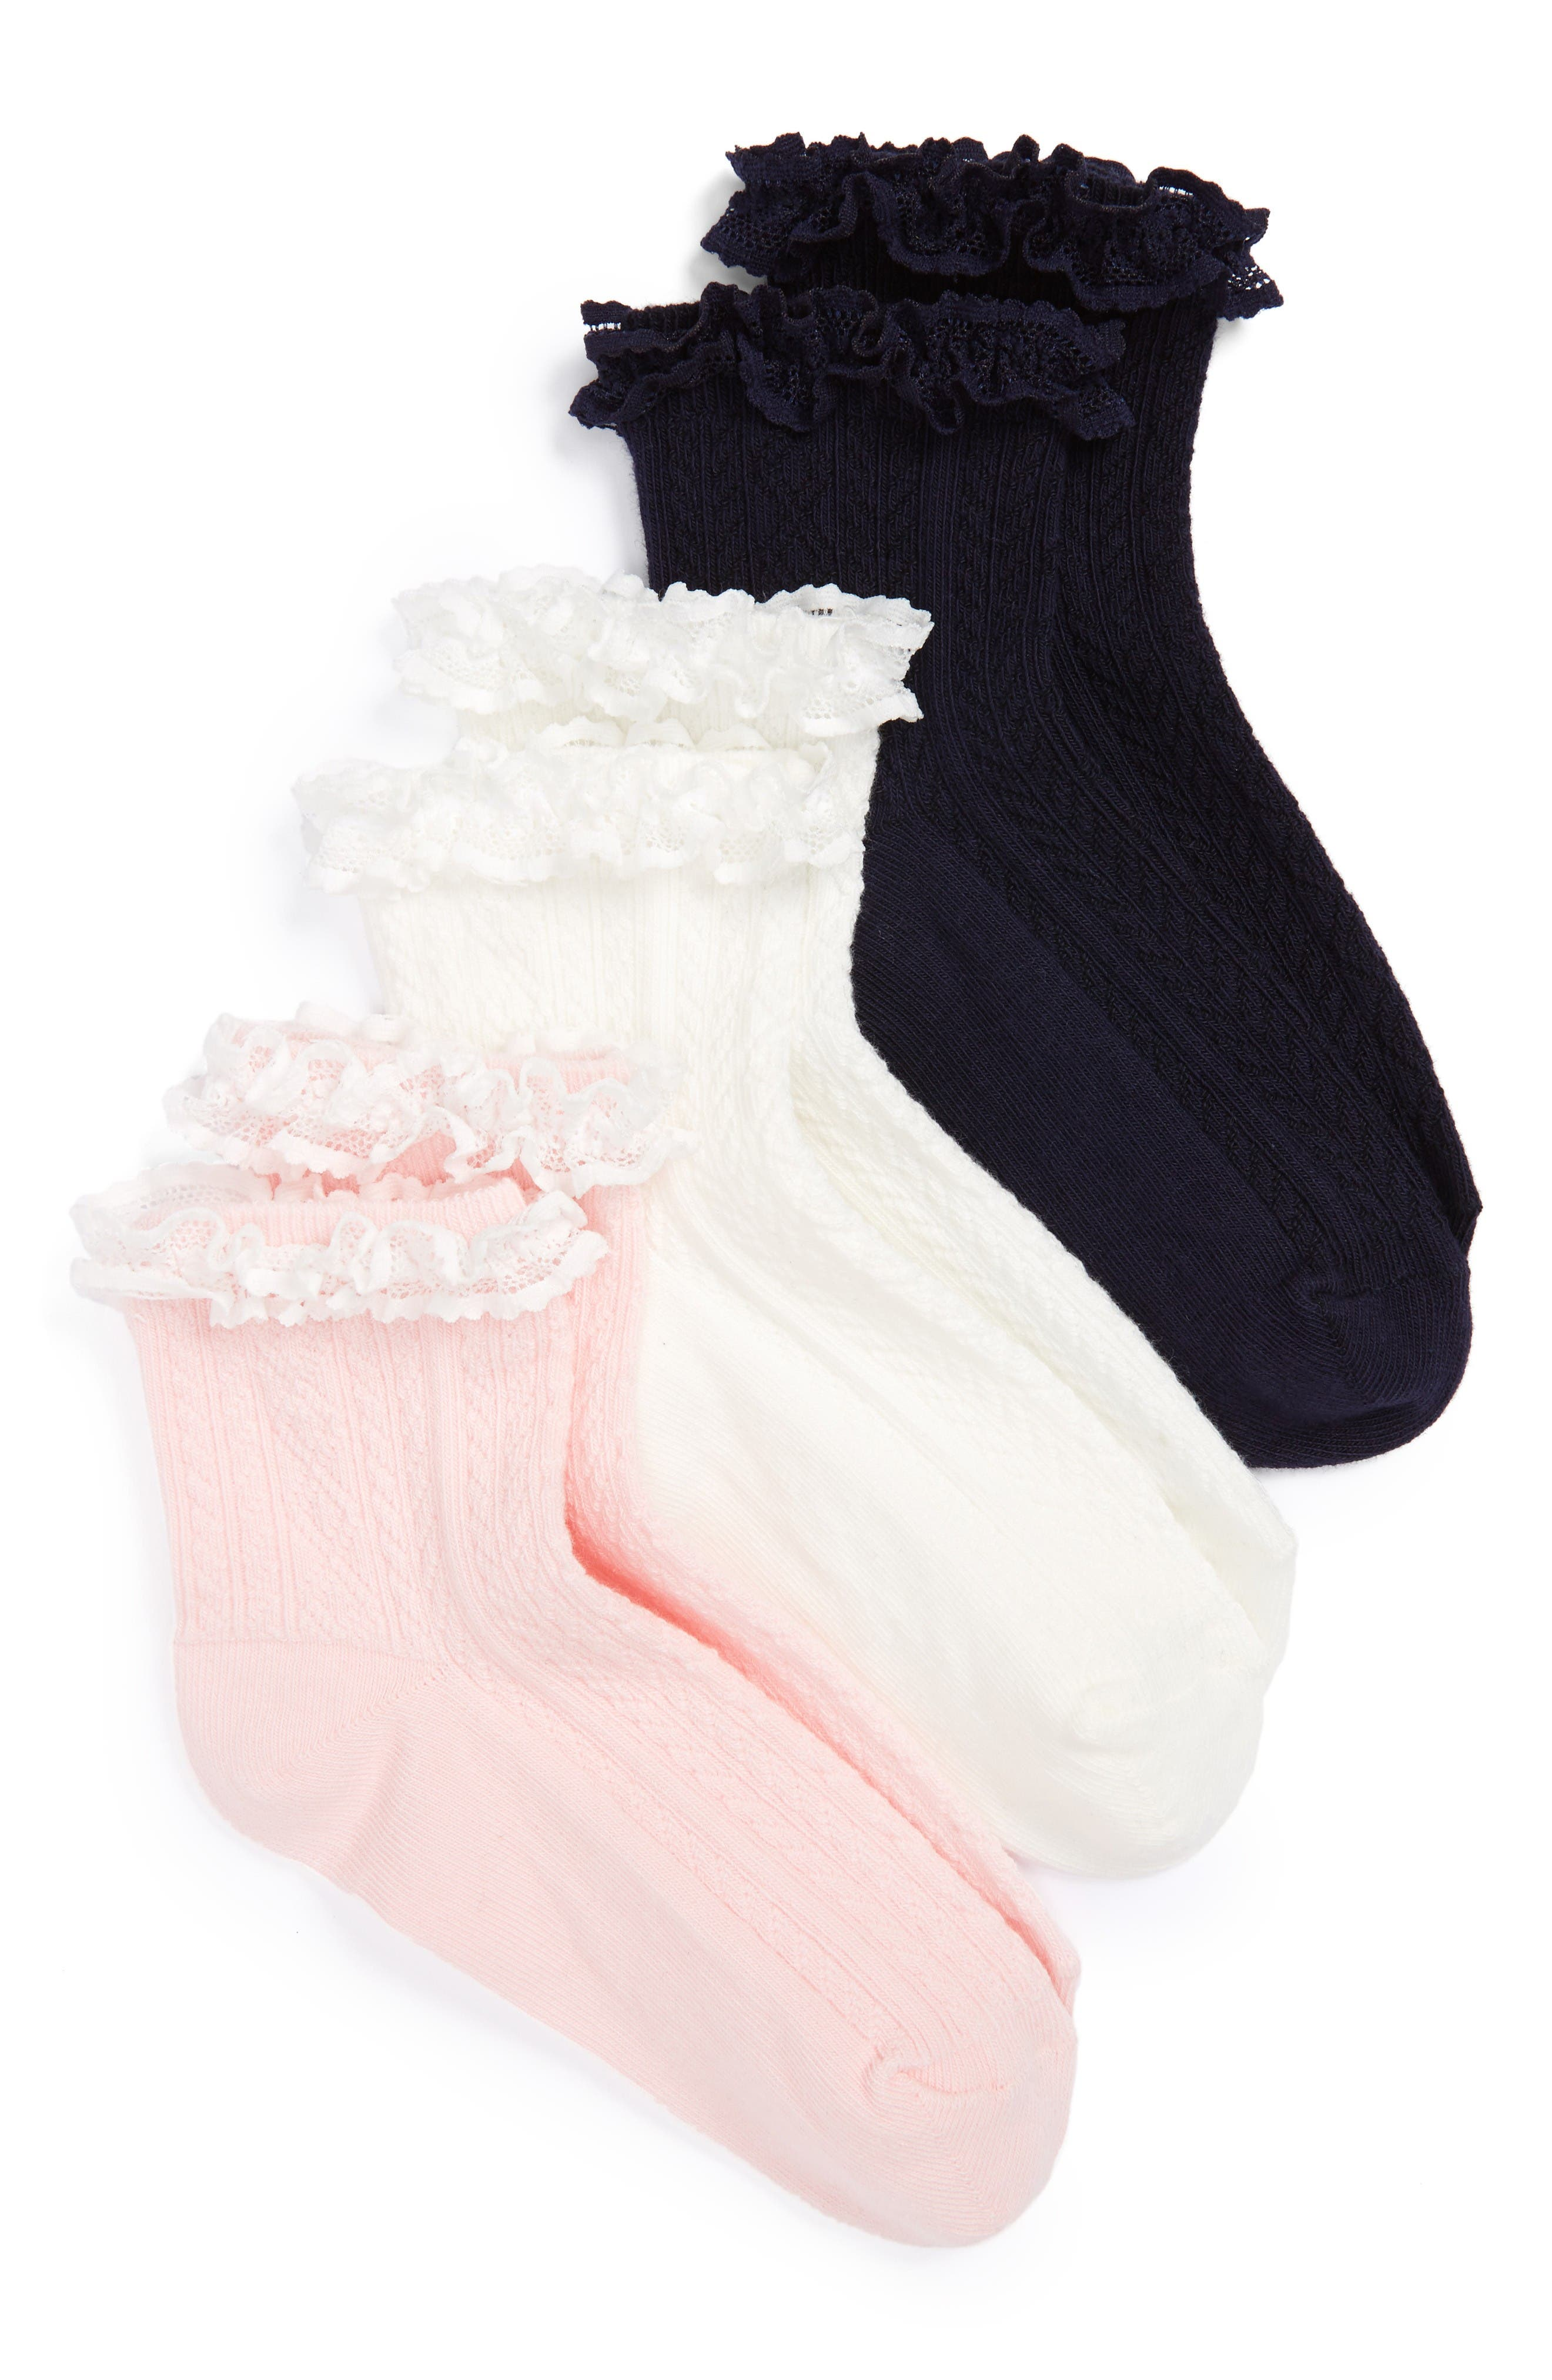 Main Image - Ruby & Bloom Short & Sweet 3-Pack Ankle Socks (Walker, Toddler, Little Kid & Big Kid)